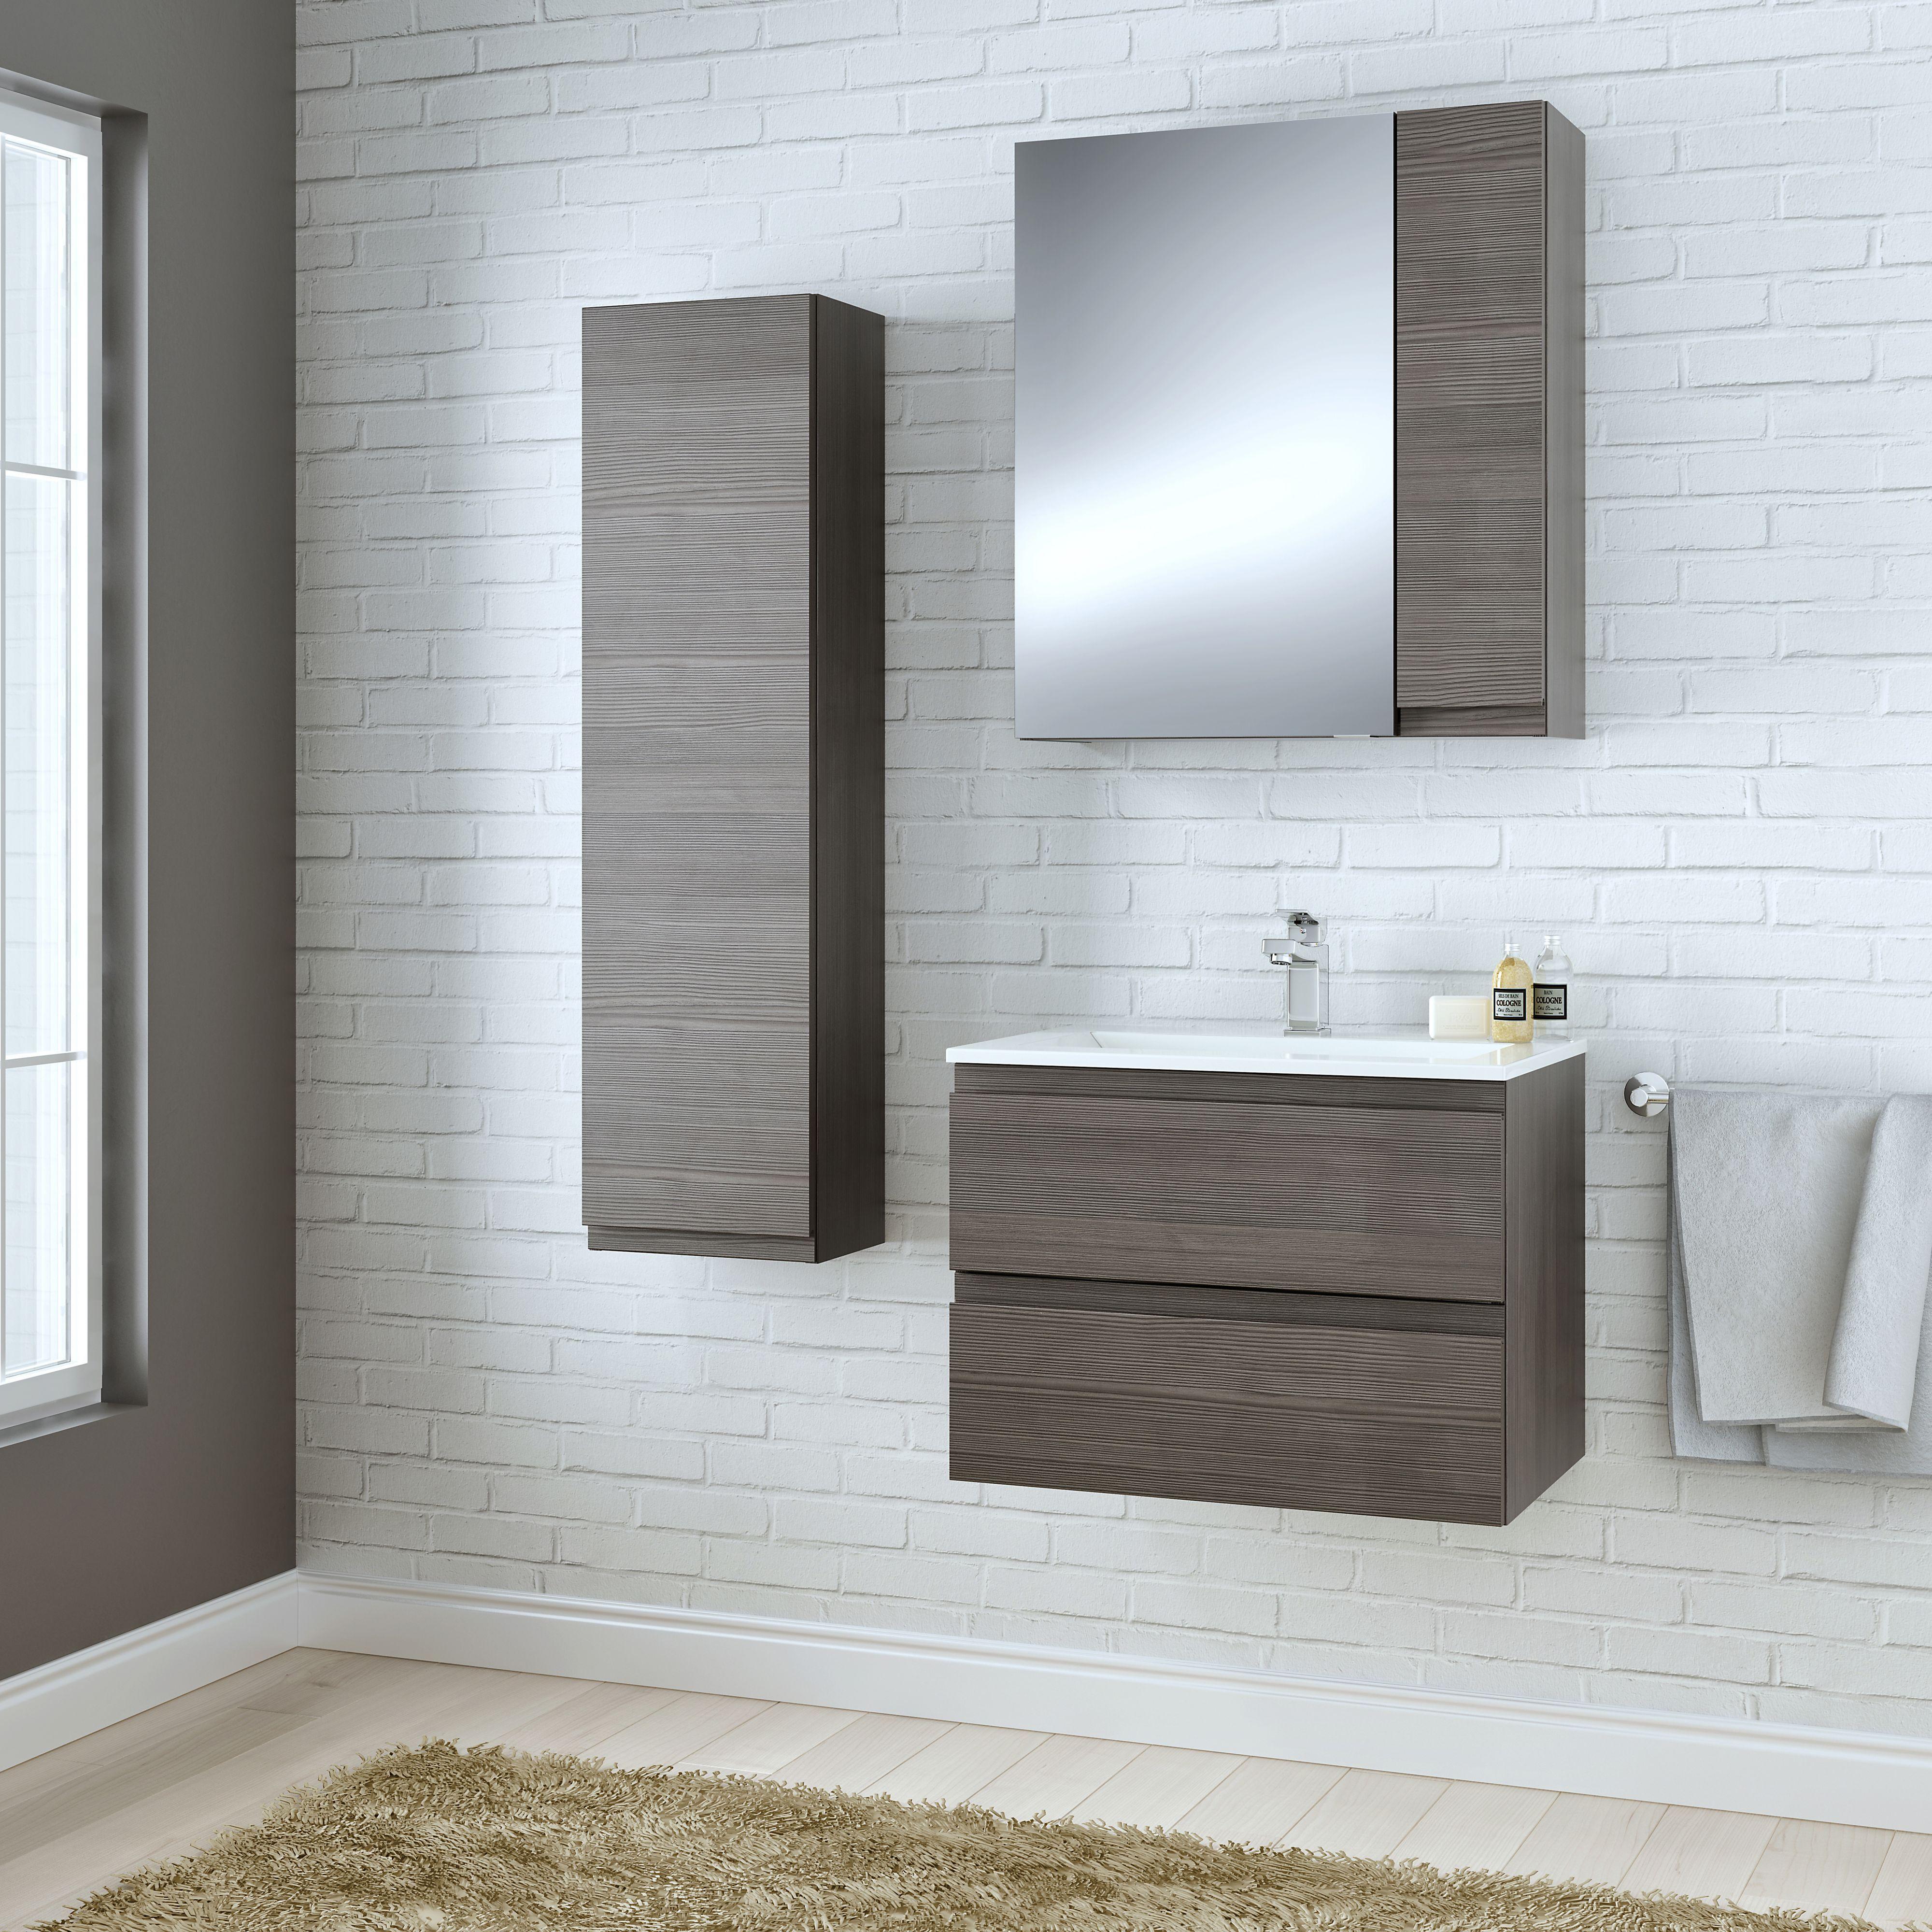 Cooke Lewis Paolo Bodega Grey Furniture Pack Departments Diy At B Q Grey Bathroom Furniture Grey Vanity Unit Bathroom Furniture